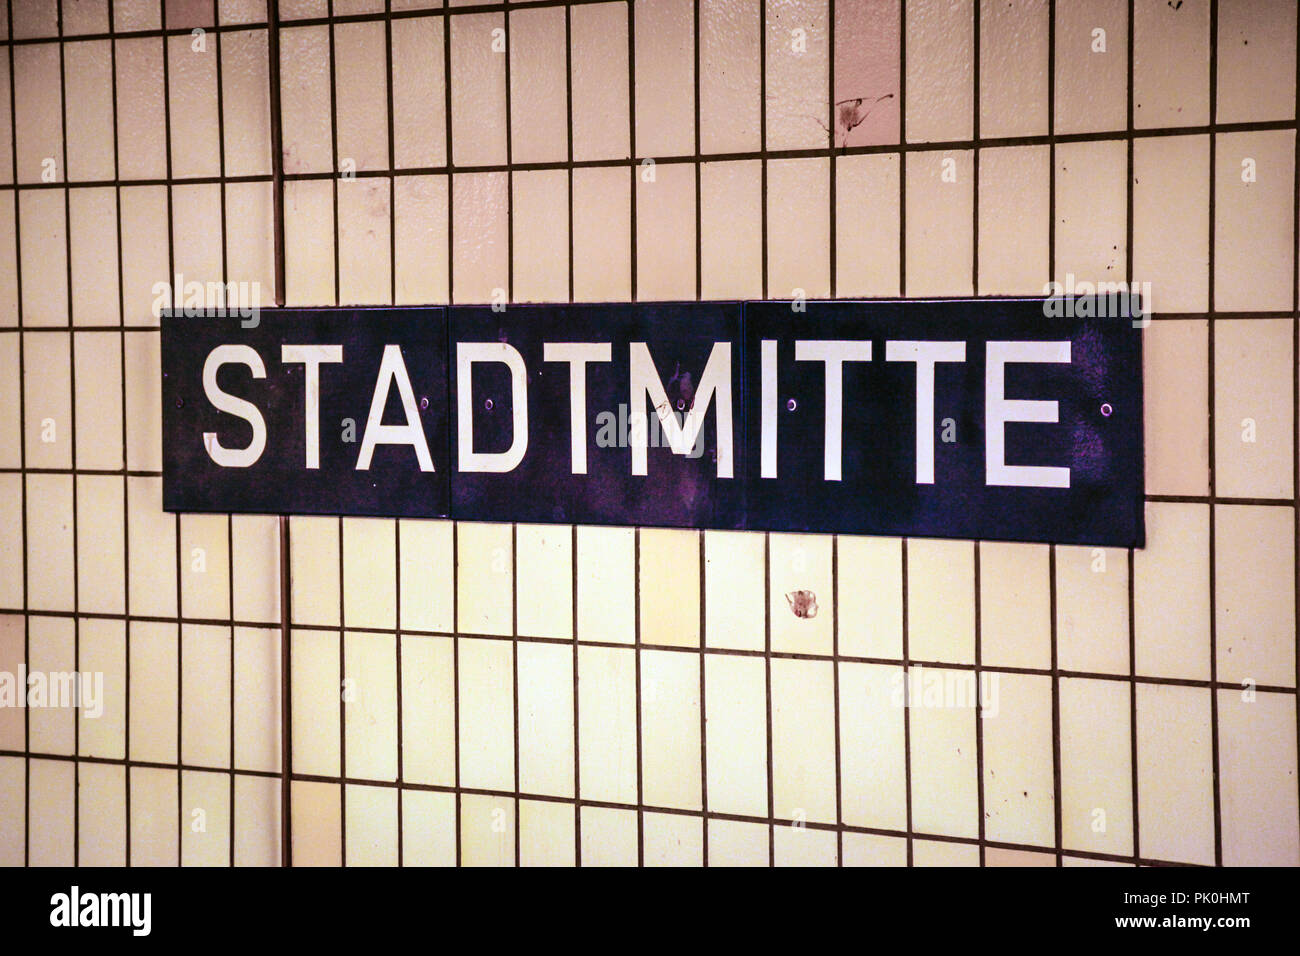 Stadtmitte (central) underground station on Friedrichstrasse in Berlin, Germany - Stock Image